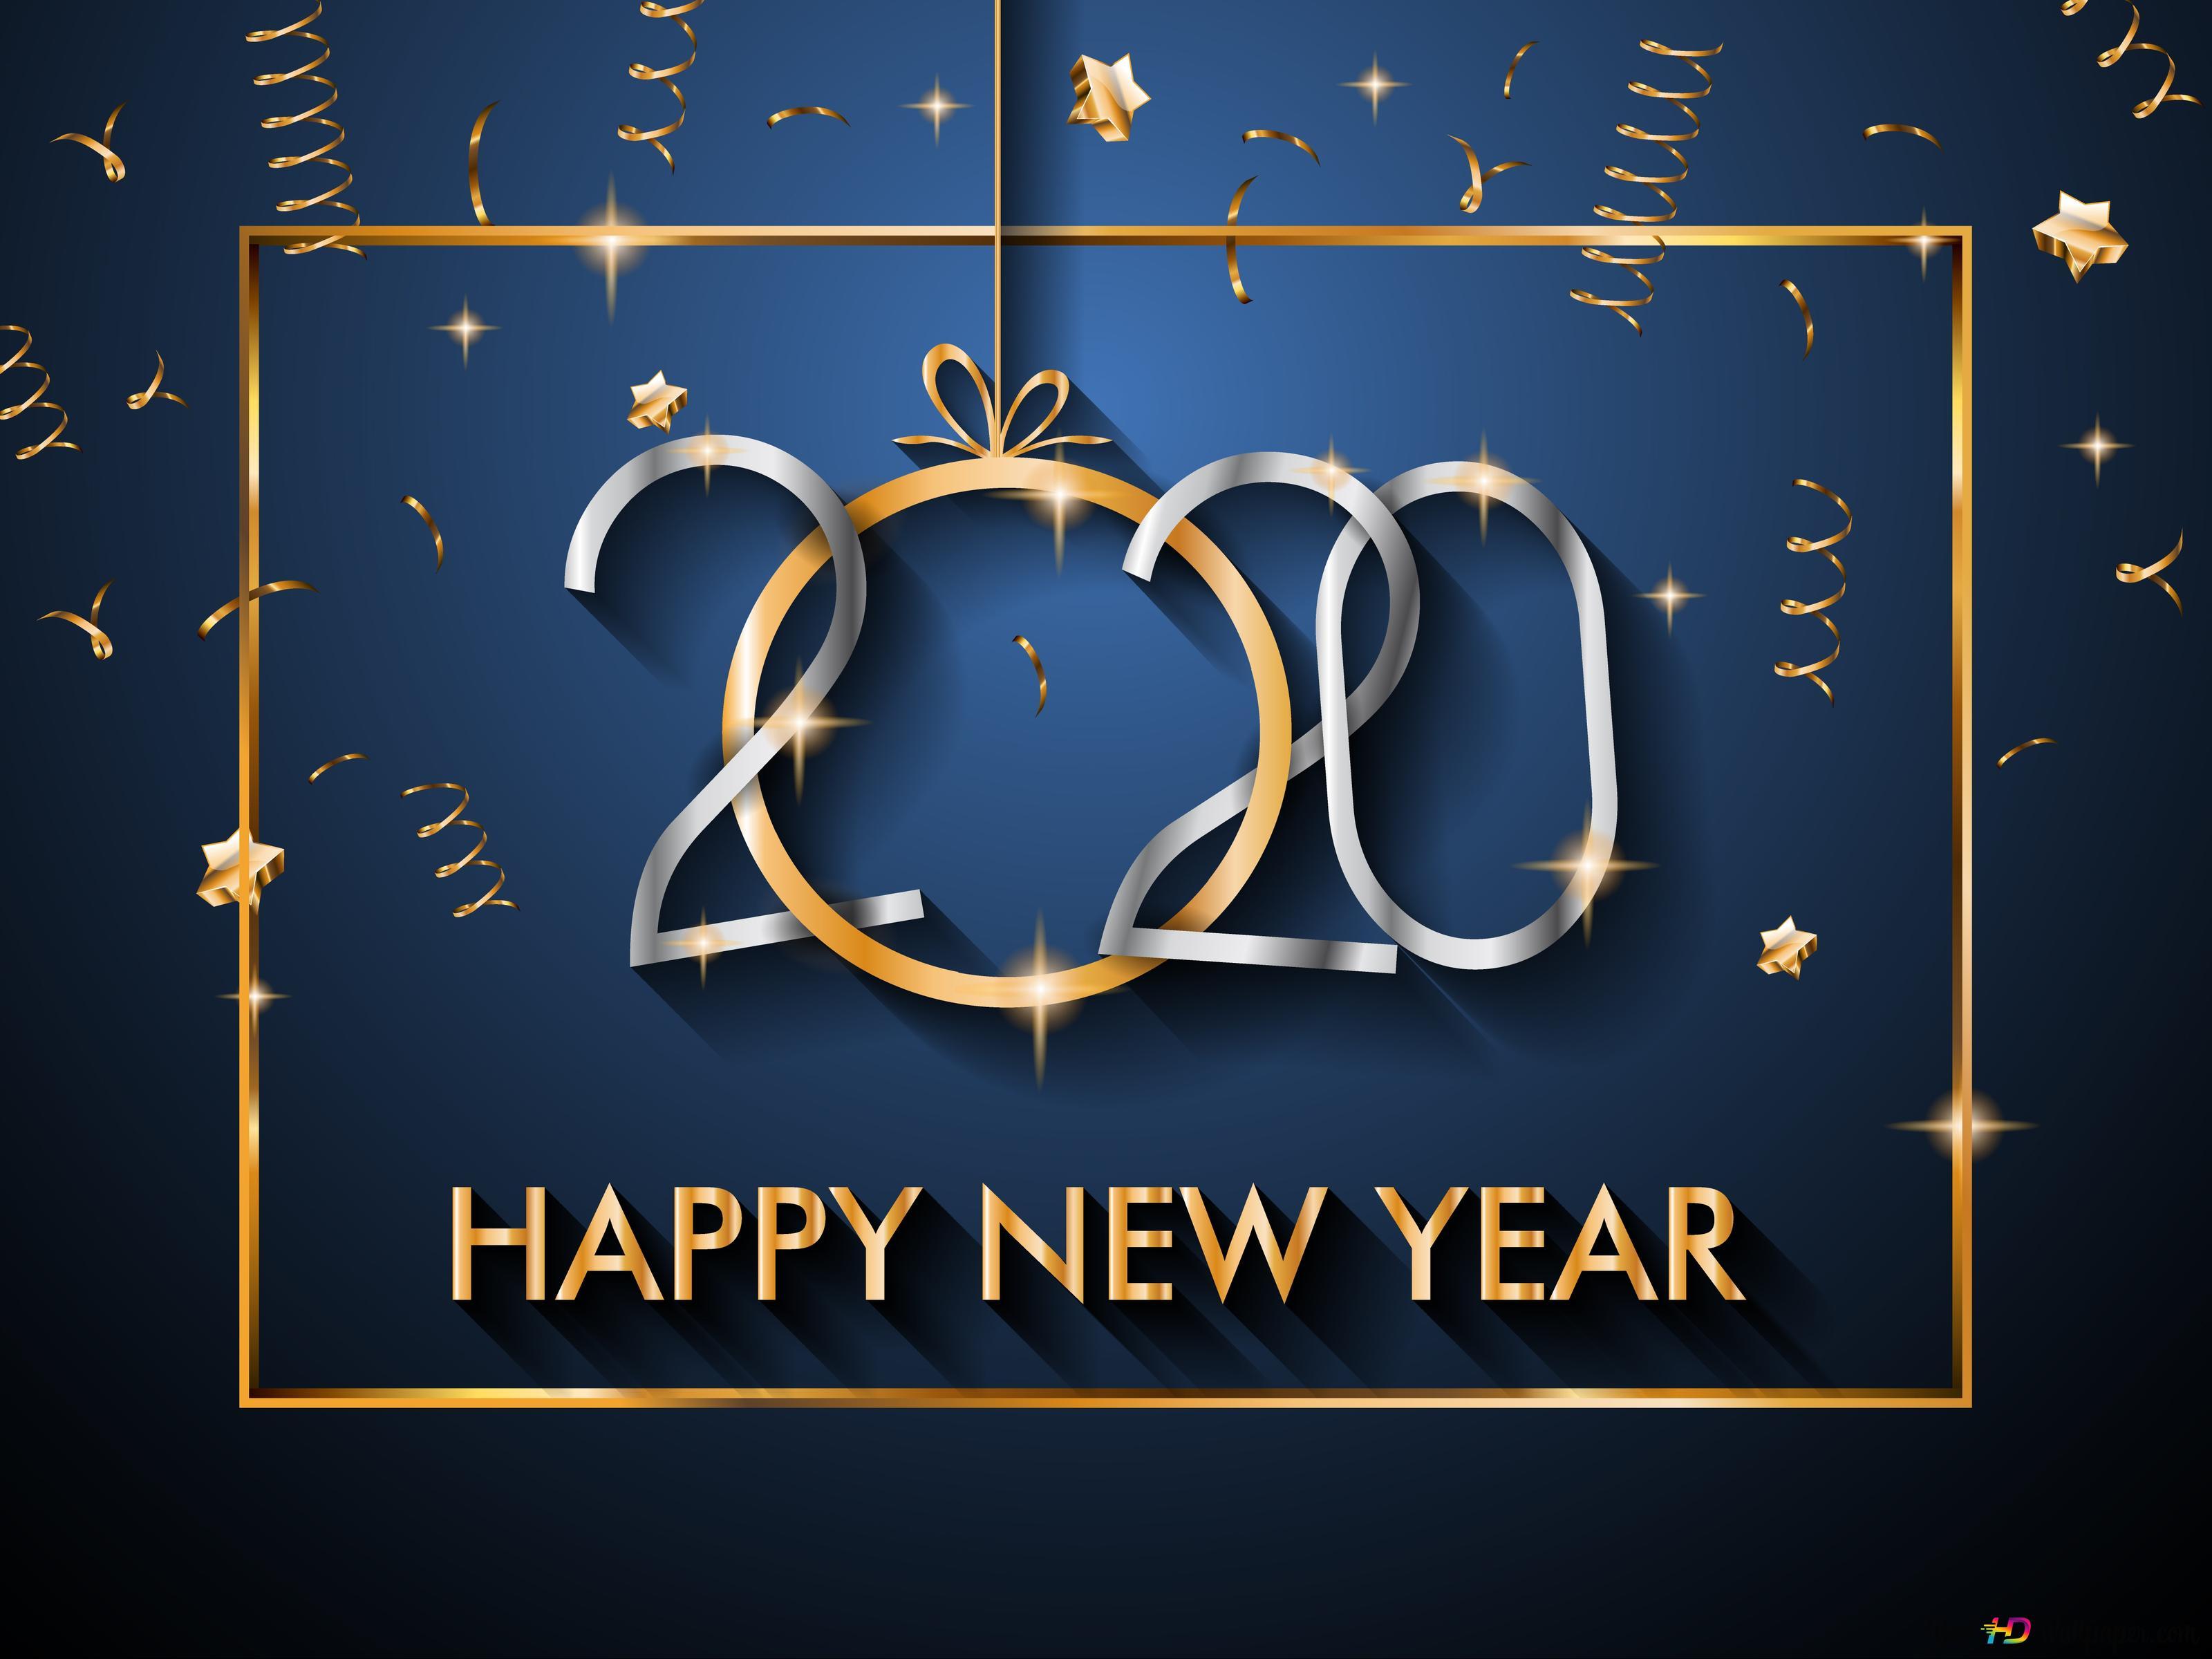 Happy year 2020 HD wallpaper download